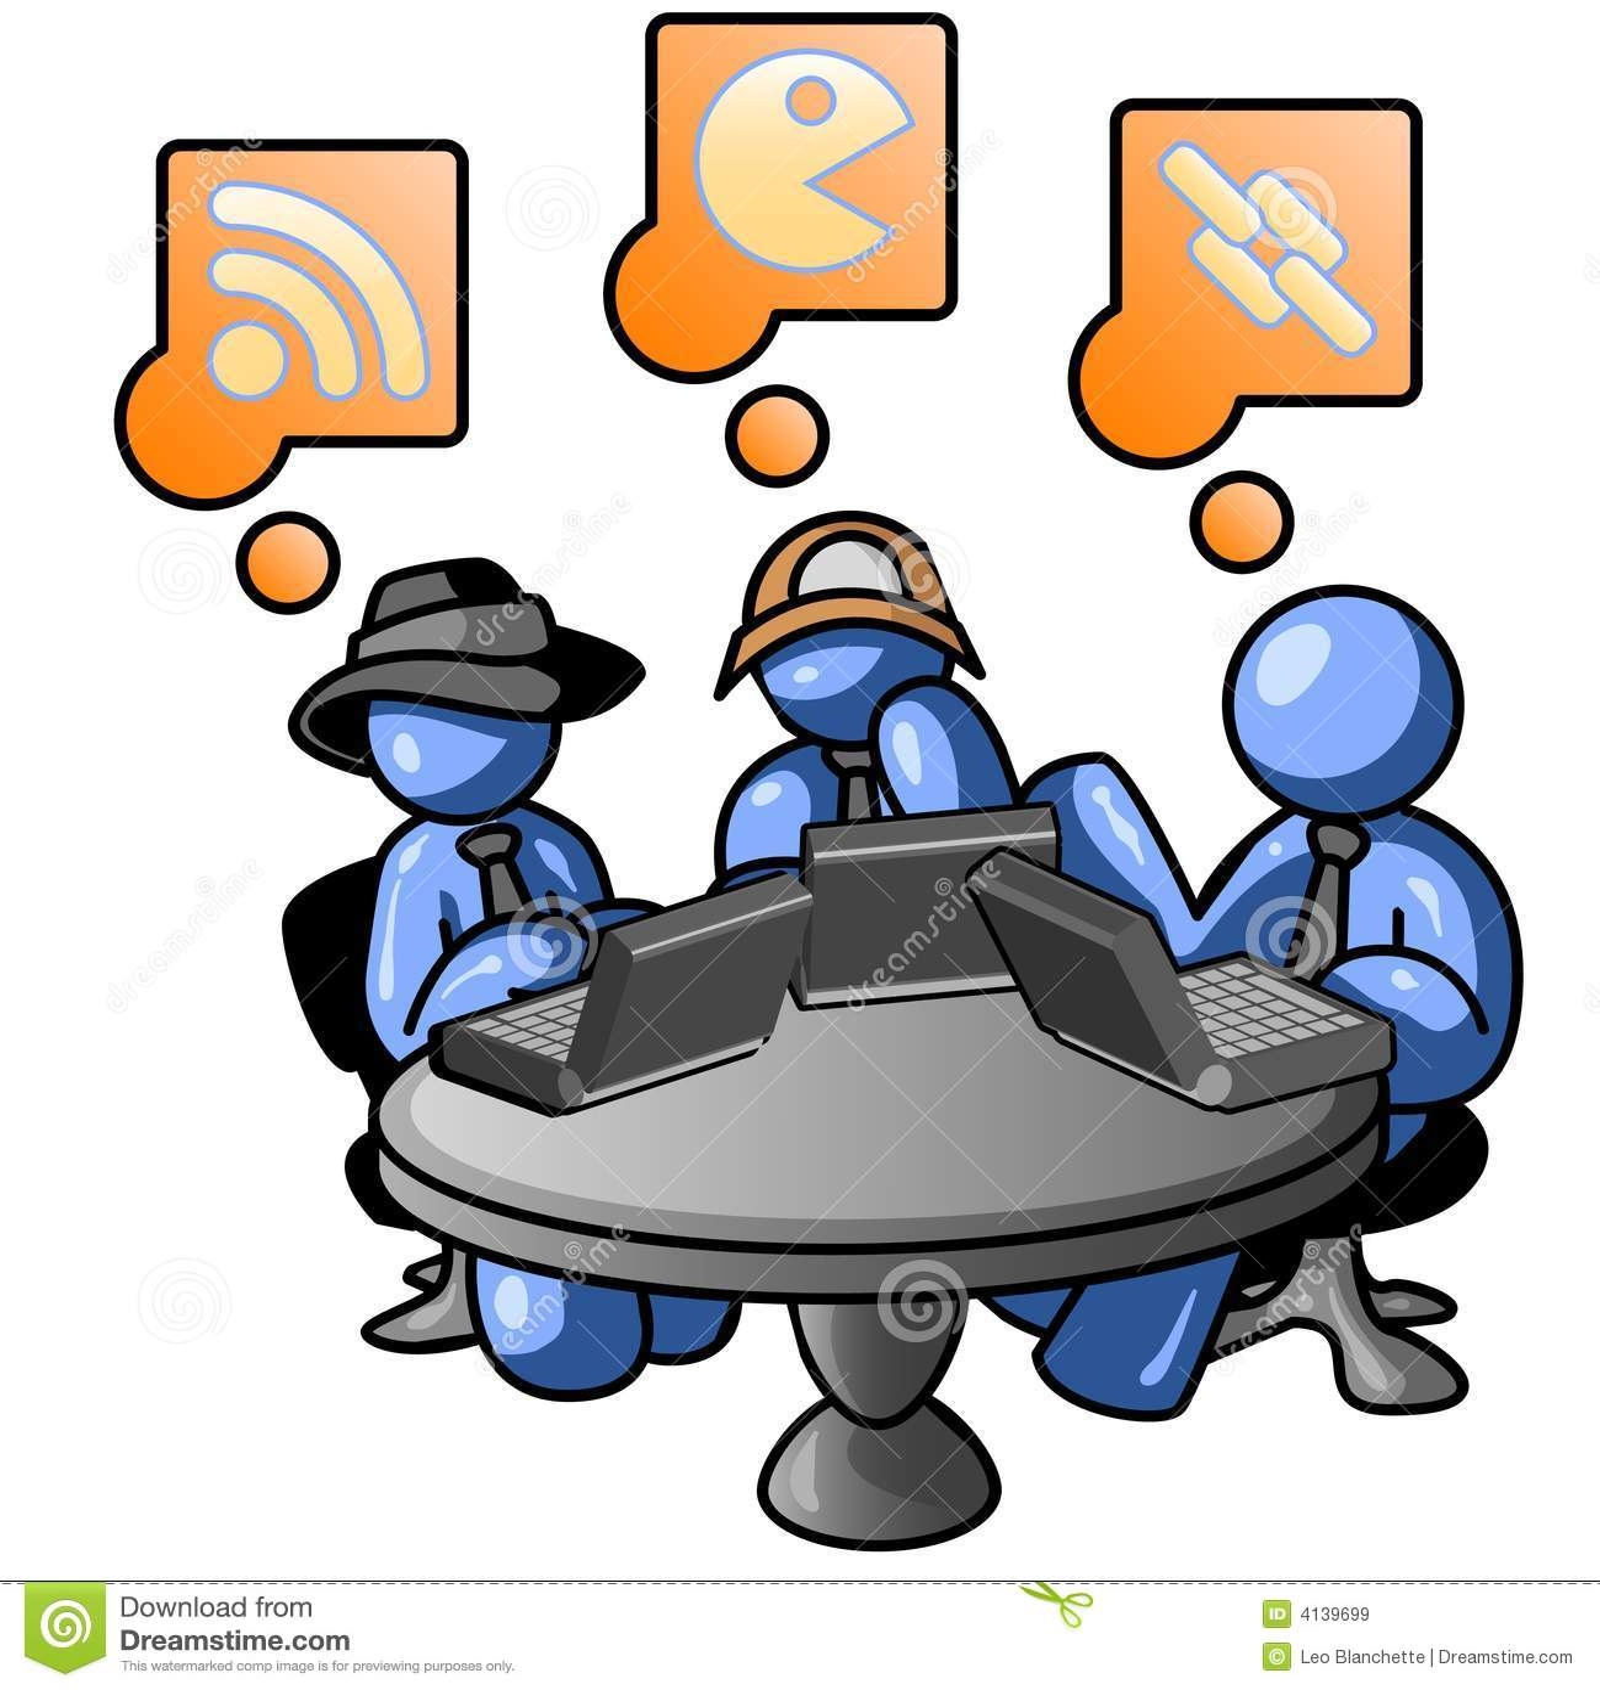 Internet Cafe Business Plan